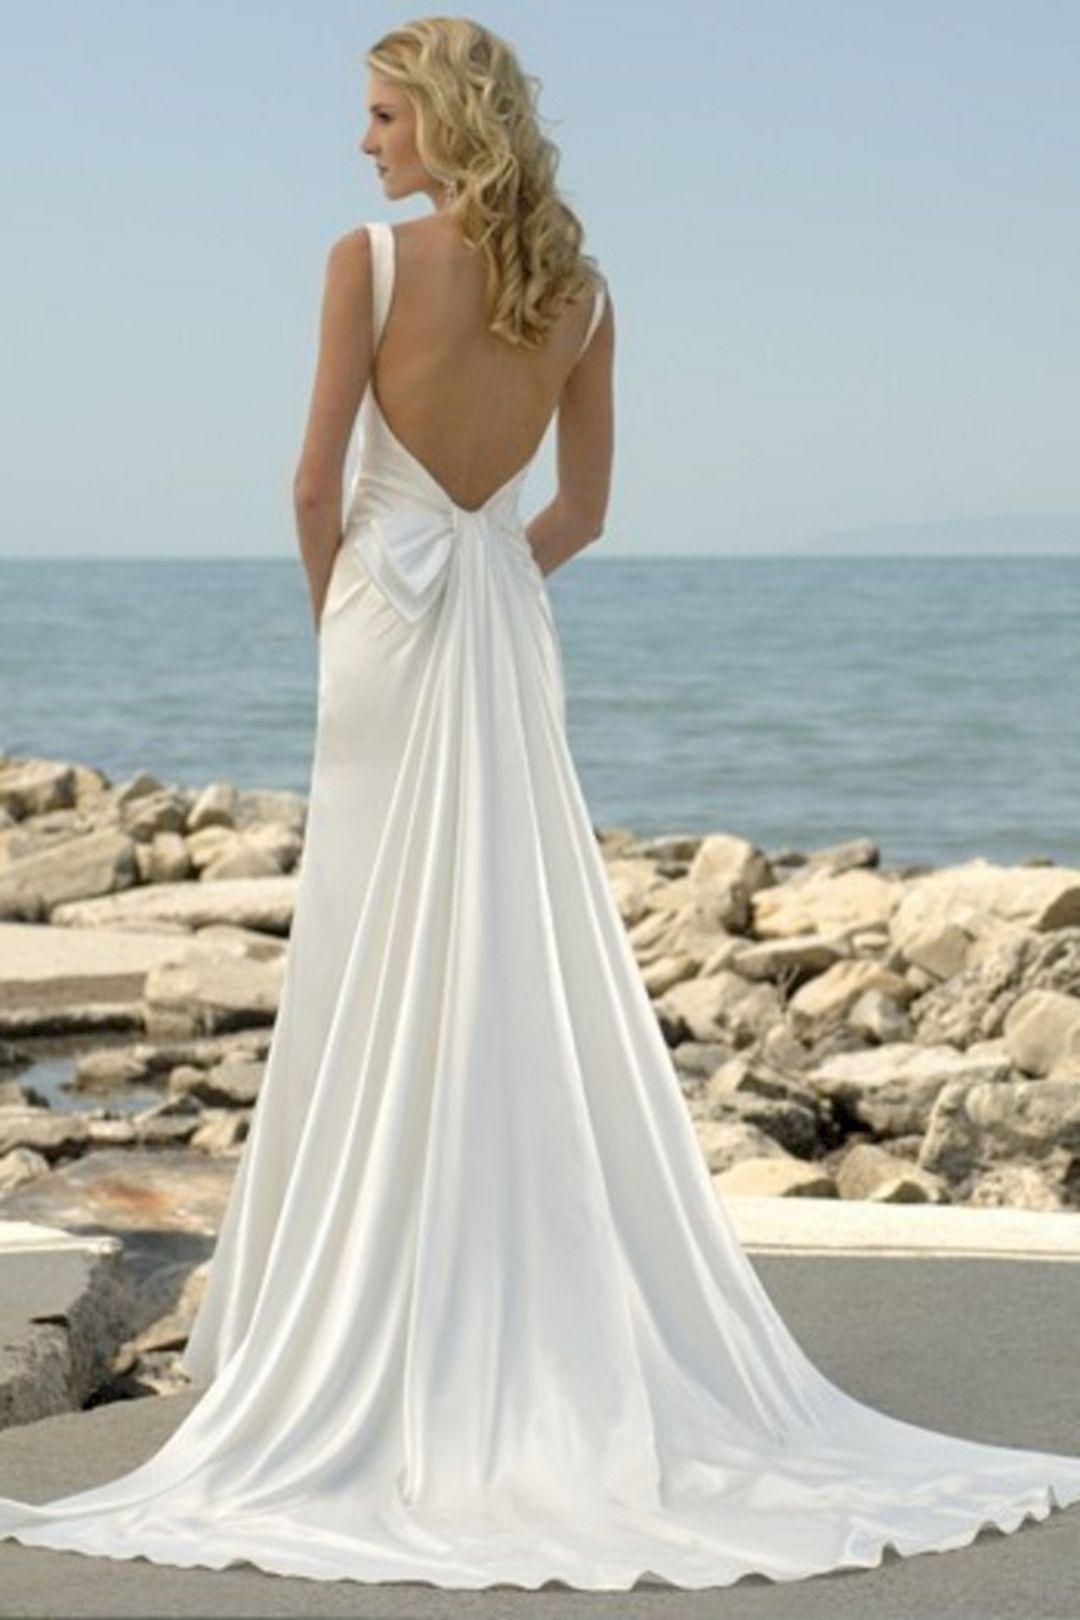 Simple beach wedding dress  Beach Wedding Dresses   Womenus fashion  Pinterest  Wedding